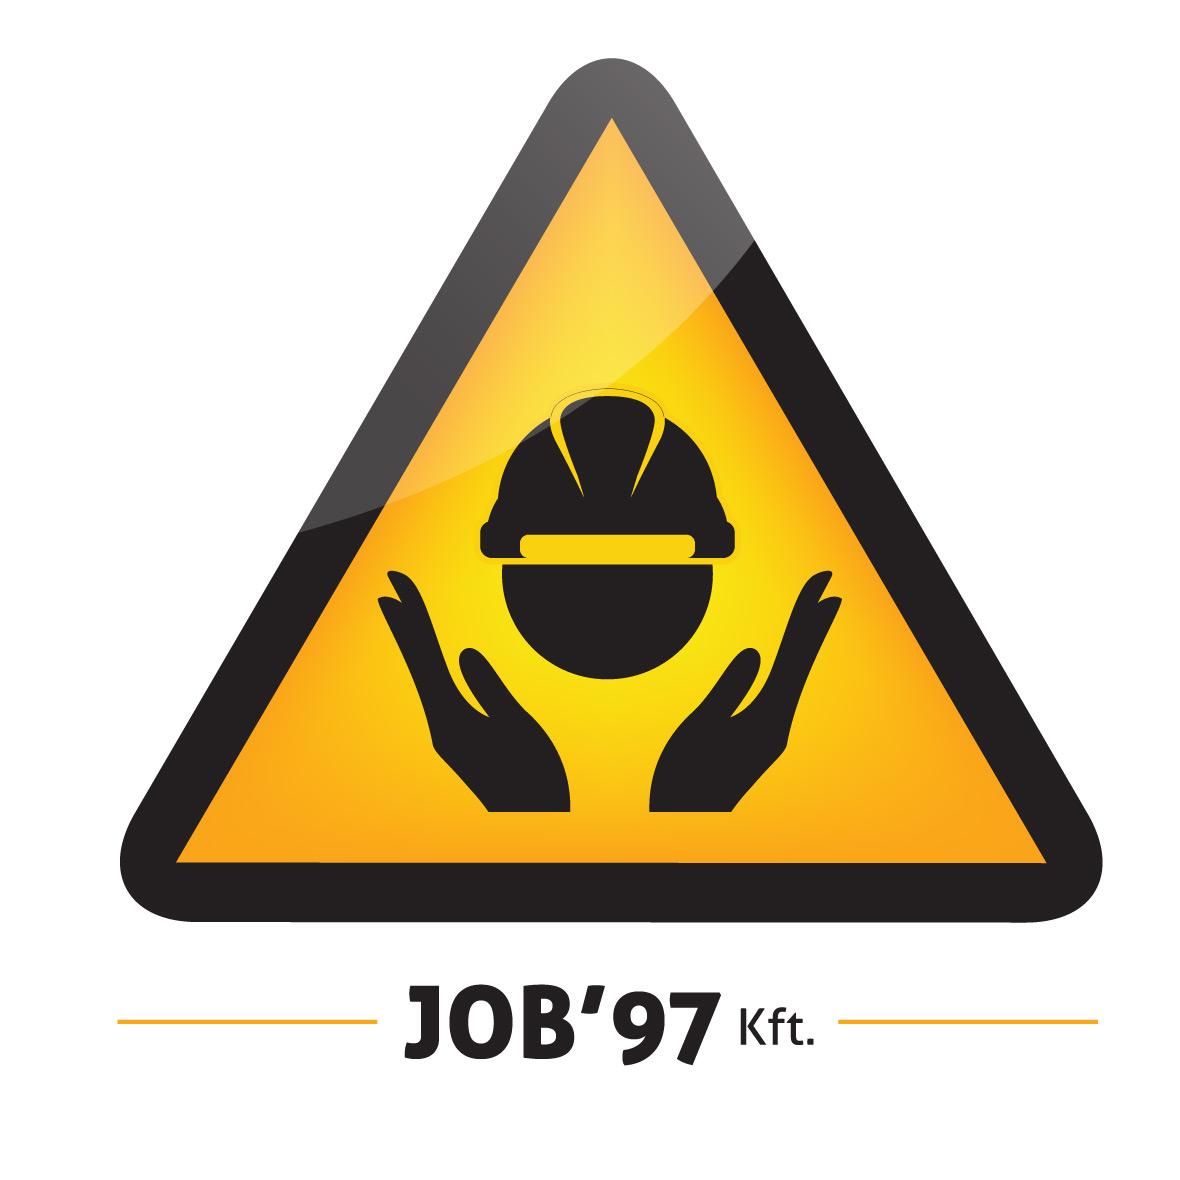 Job ' 97 Kft.